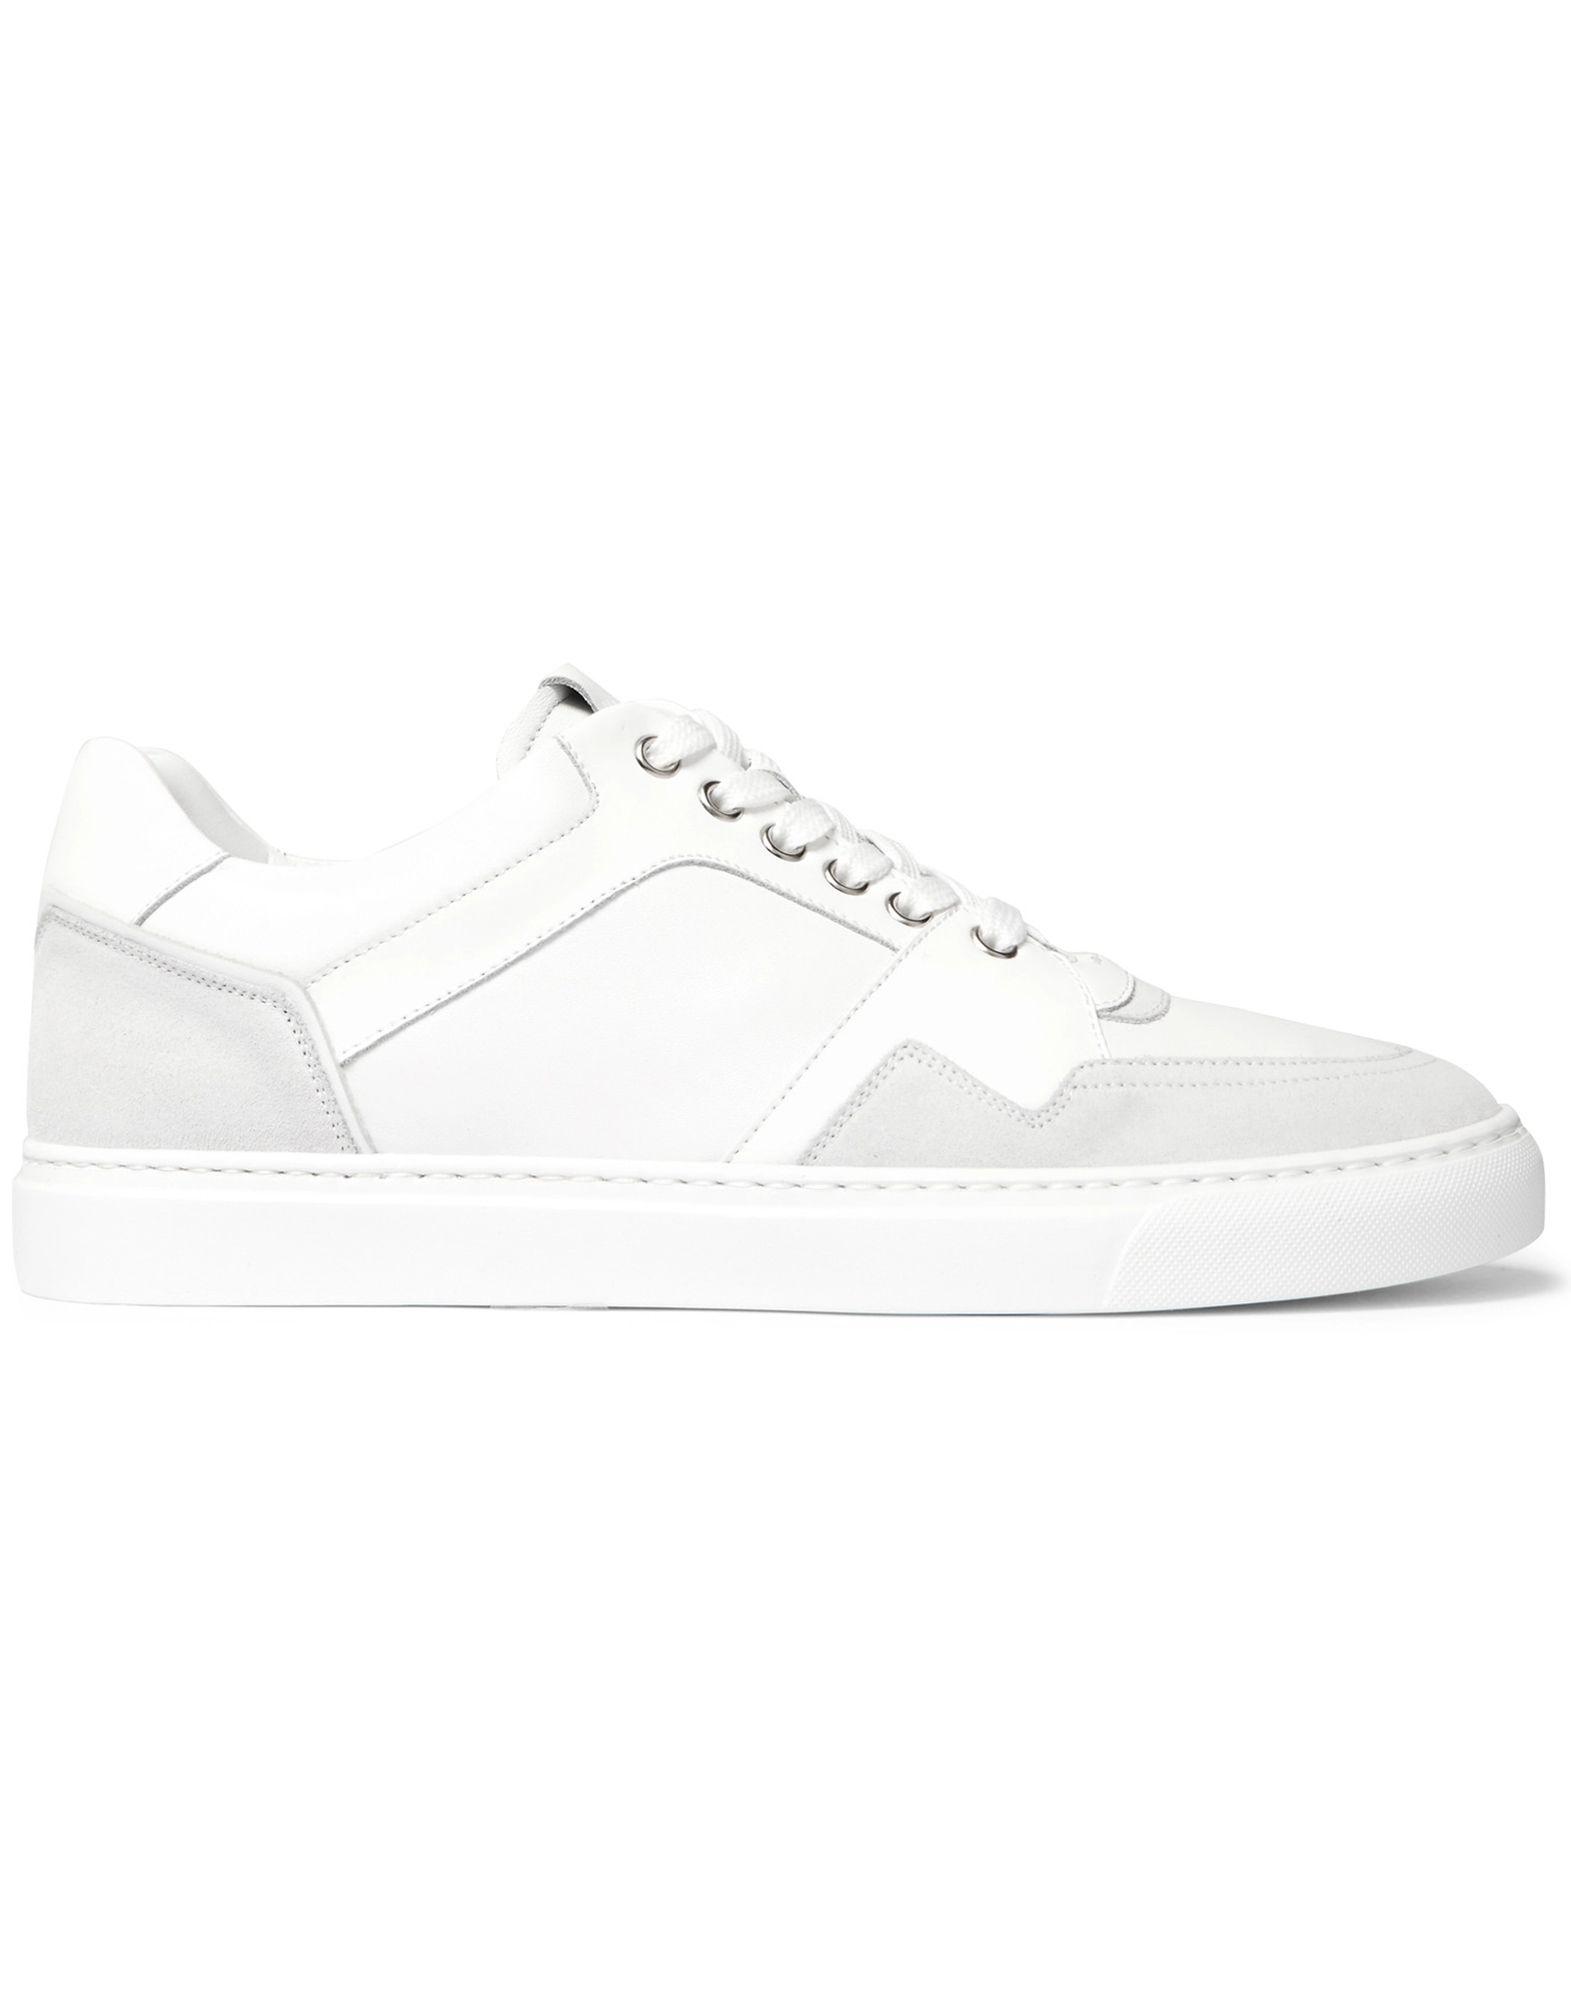 Harrys Of London Sneakers Herren  11539729NB Gute Qualität beliebte Schuhe